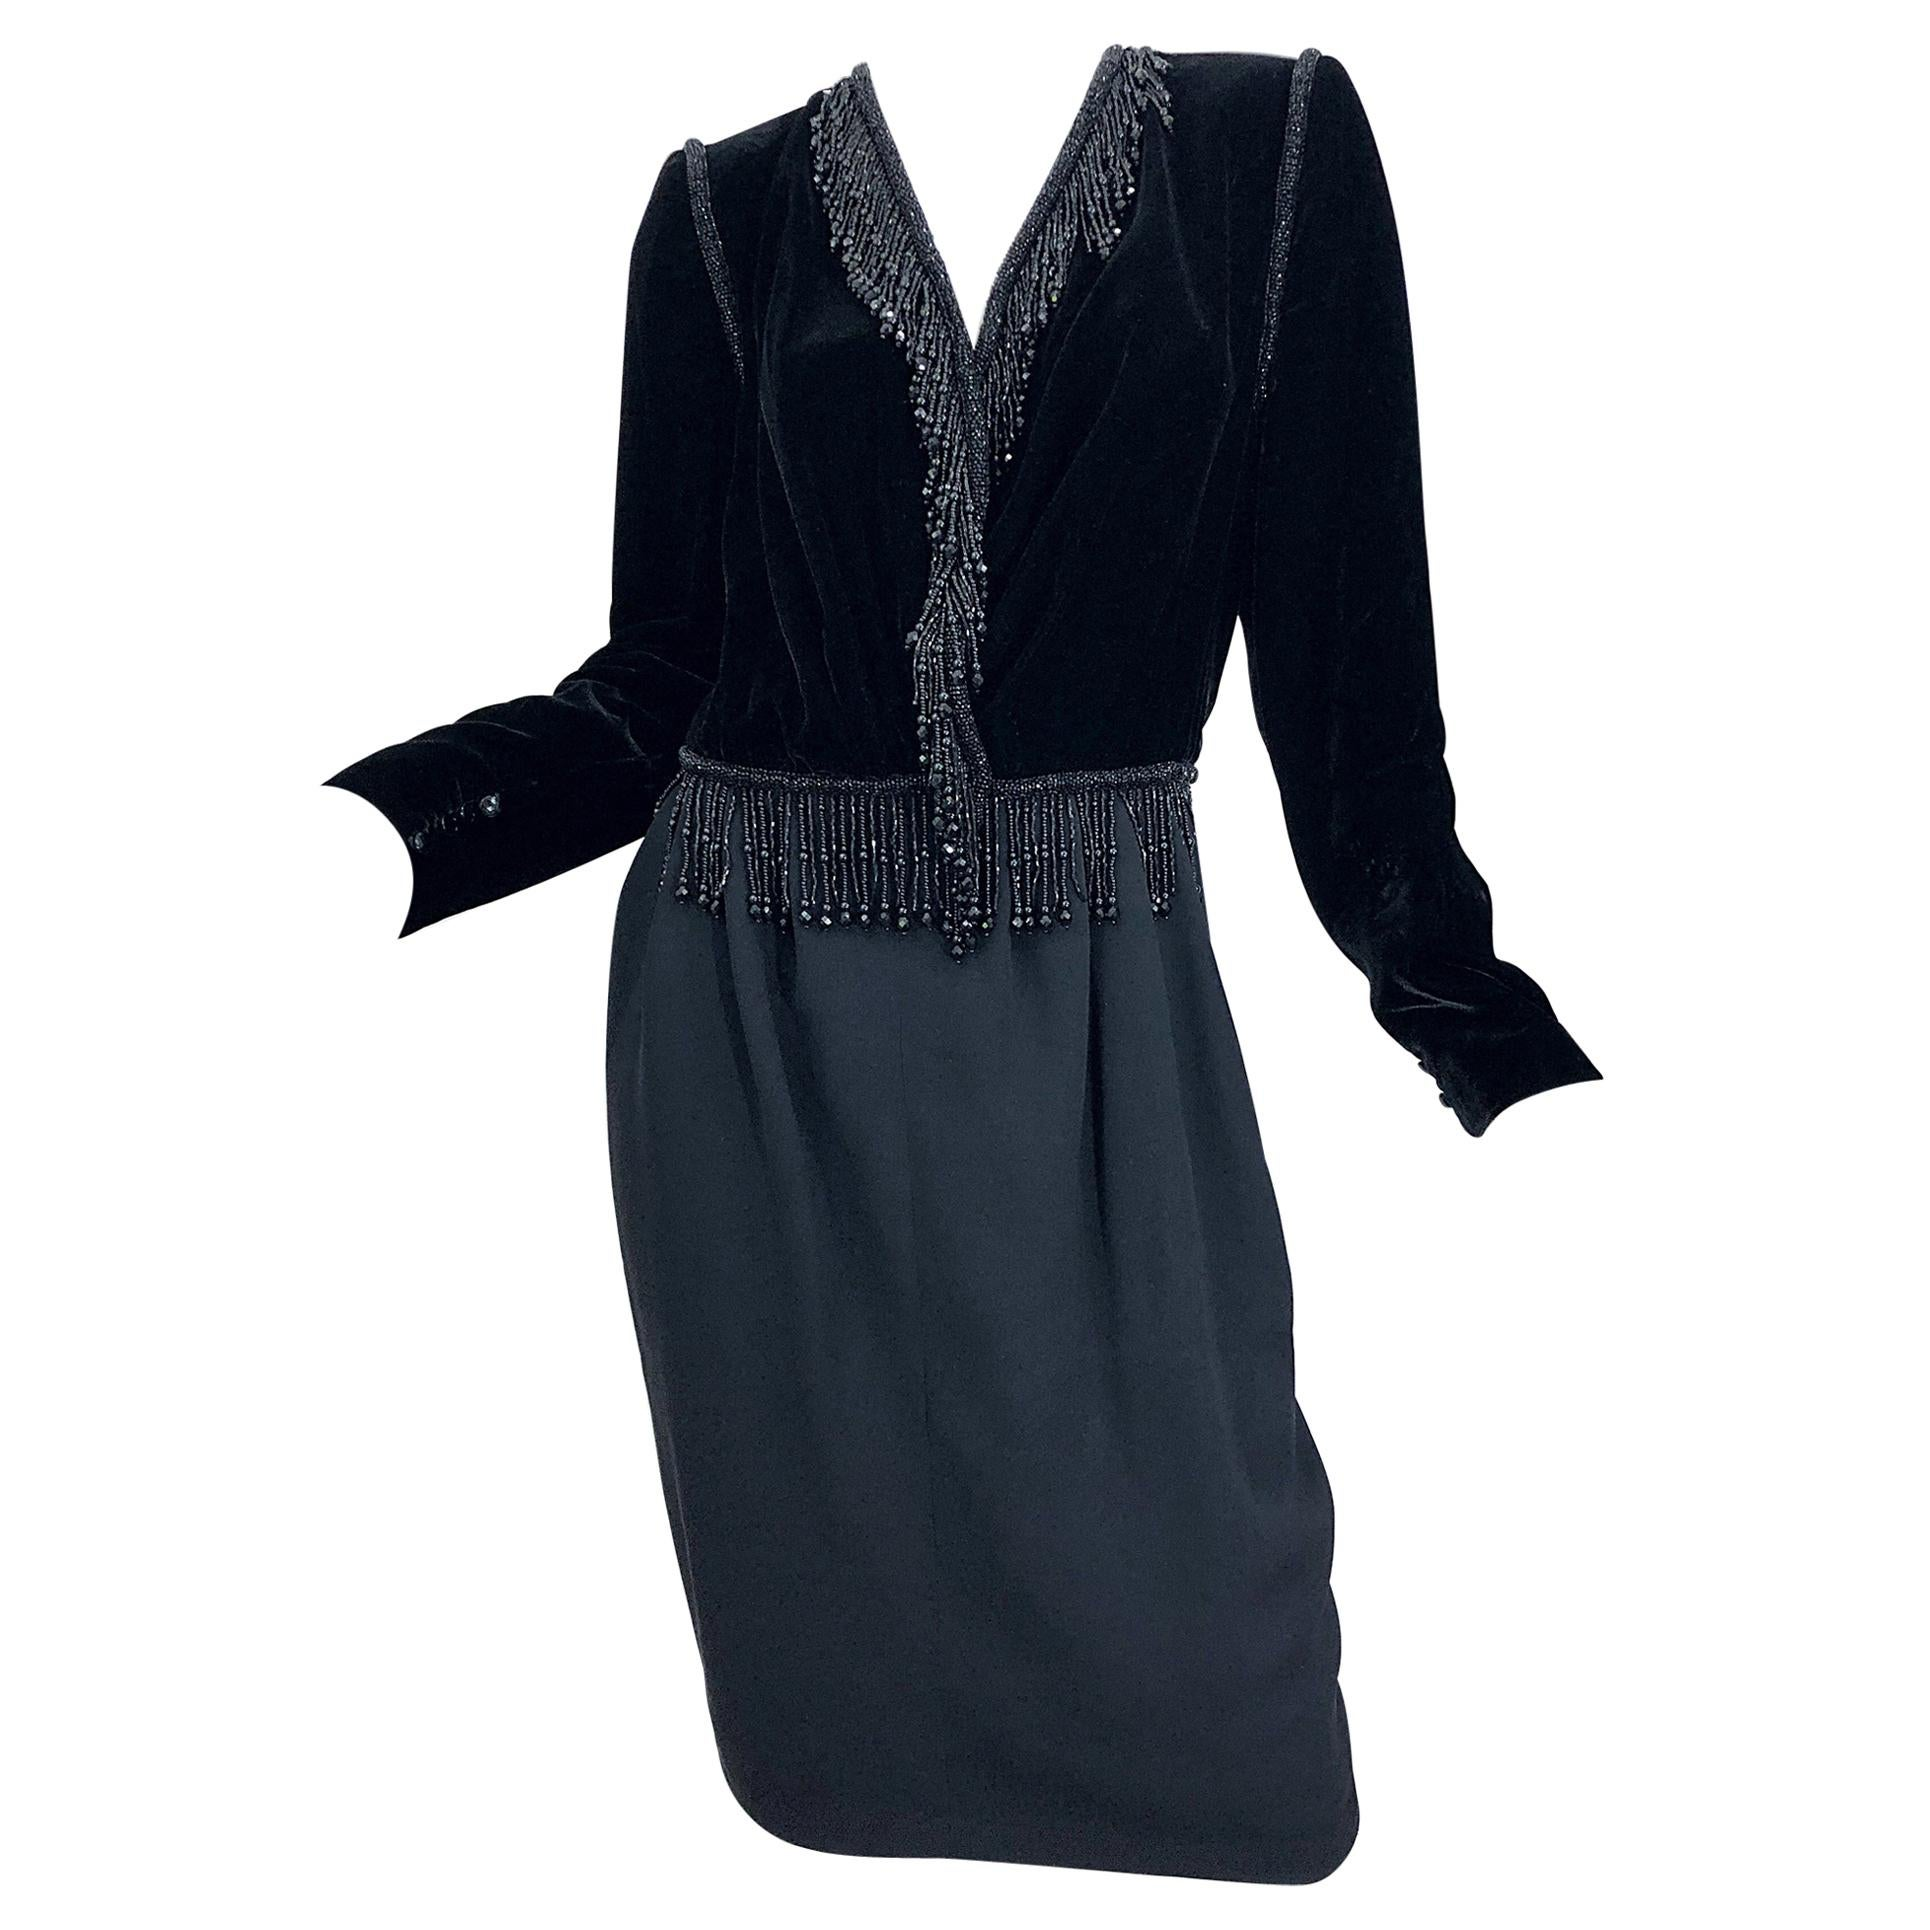 Vintage Odicini Couture Black Velvet Rayon Beaded Large Size Long Sleeve Dress